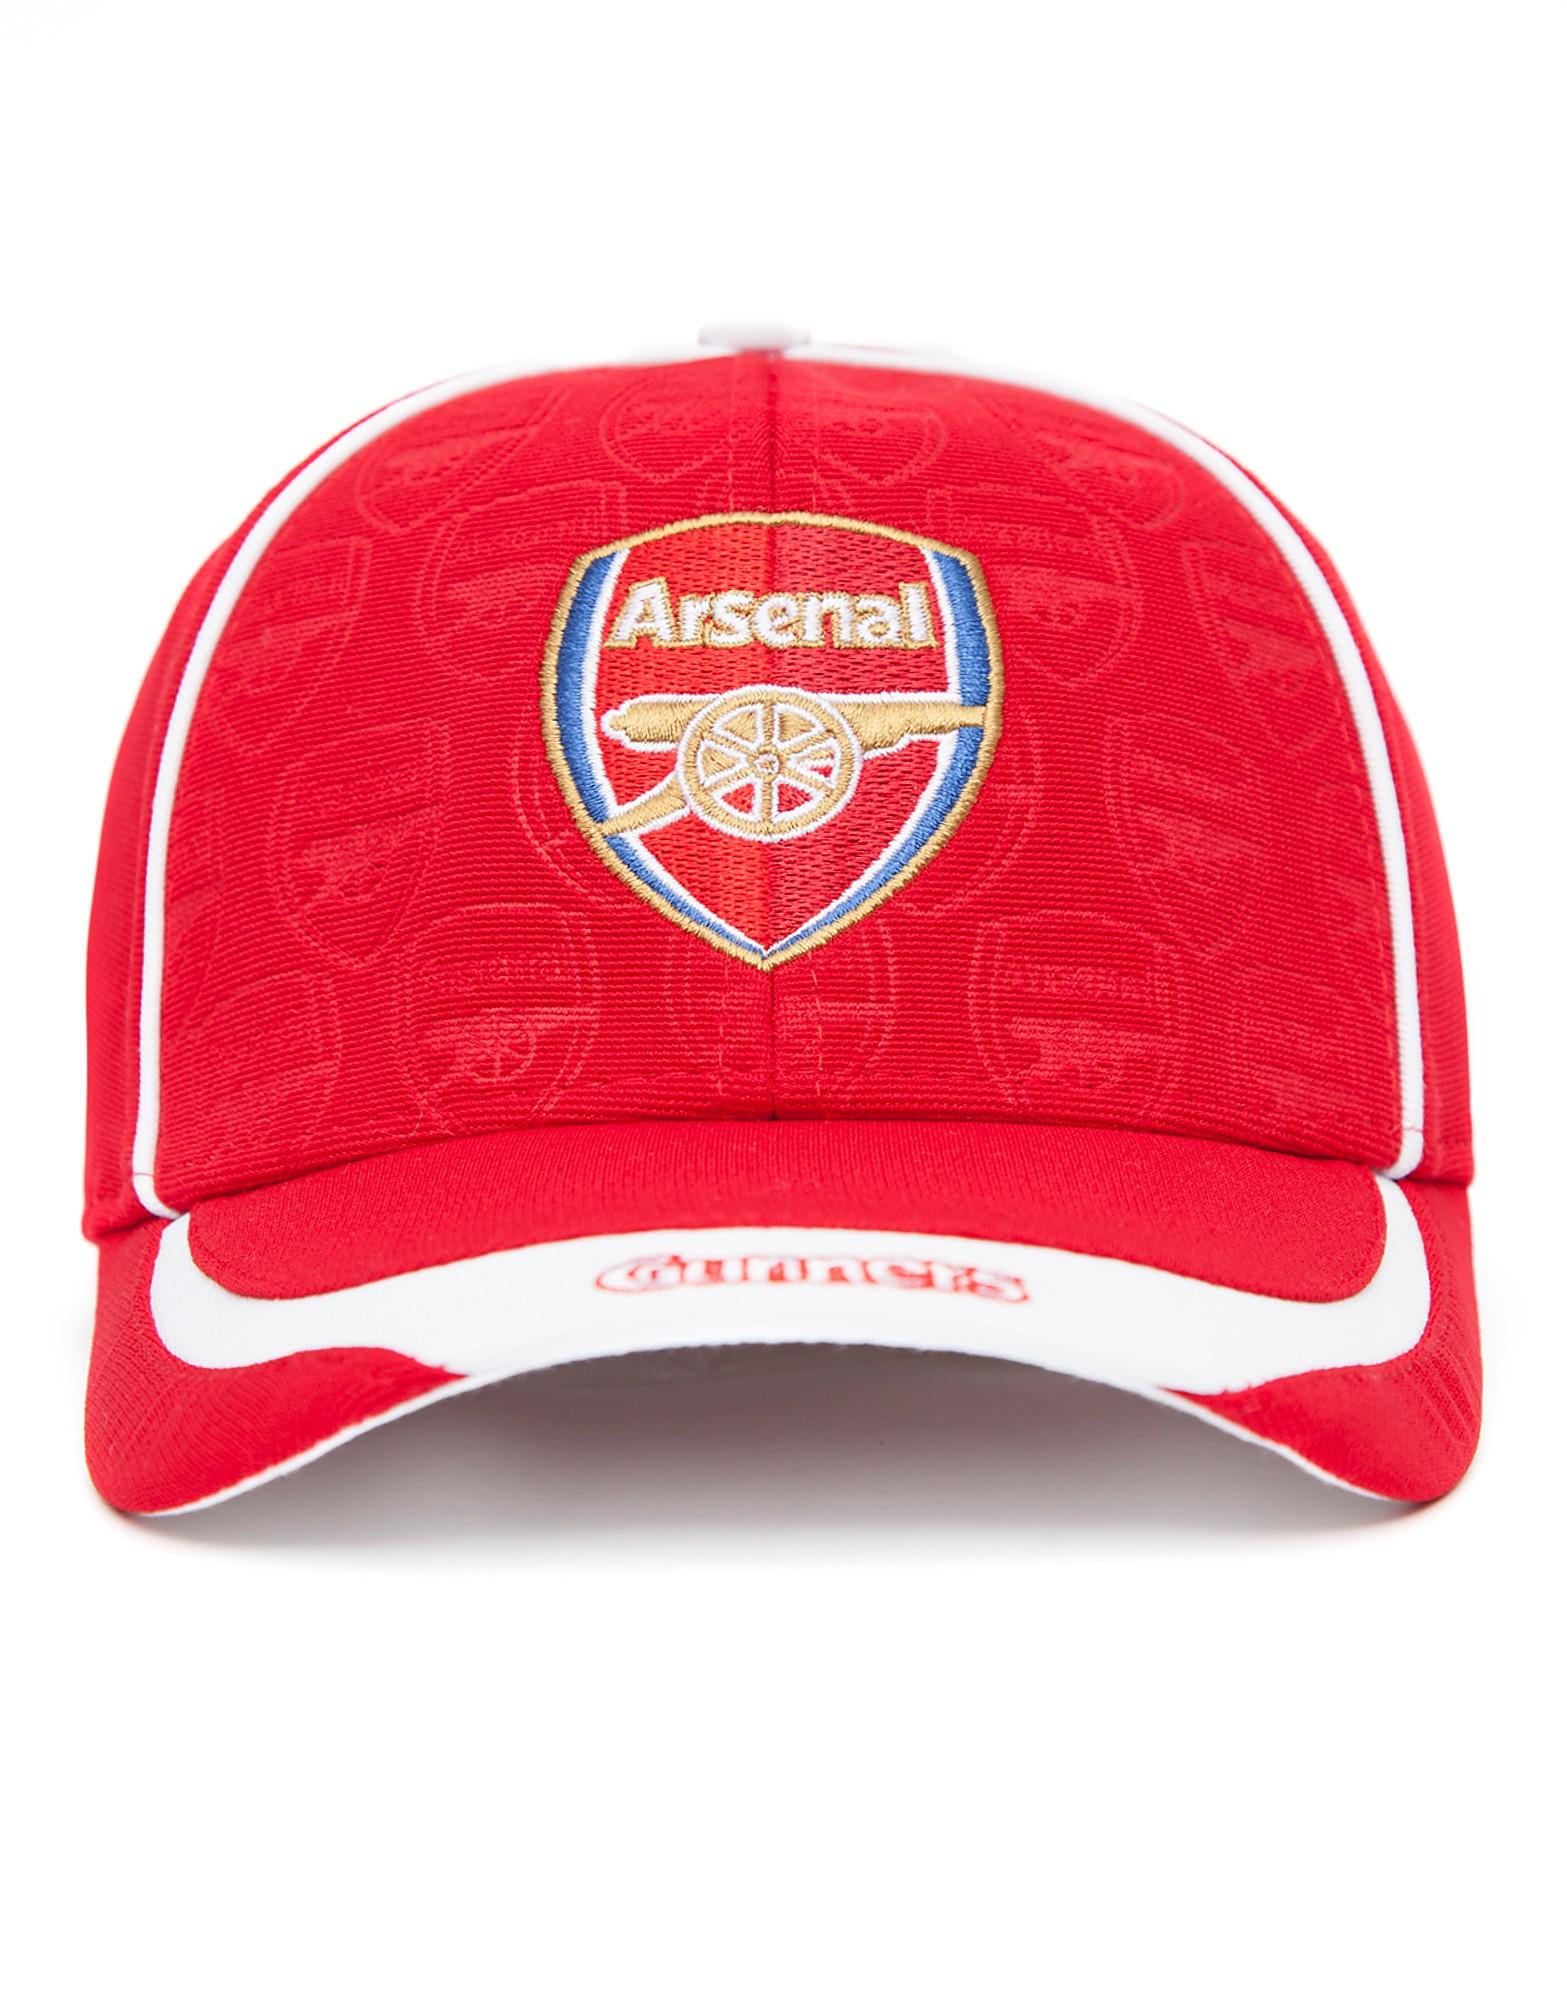 Official Team Arsenal FC Deboss Cap - Red/White - Mens, Red/White